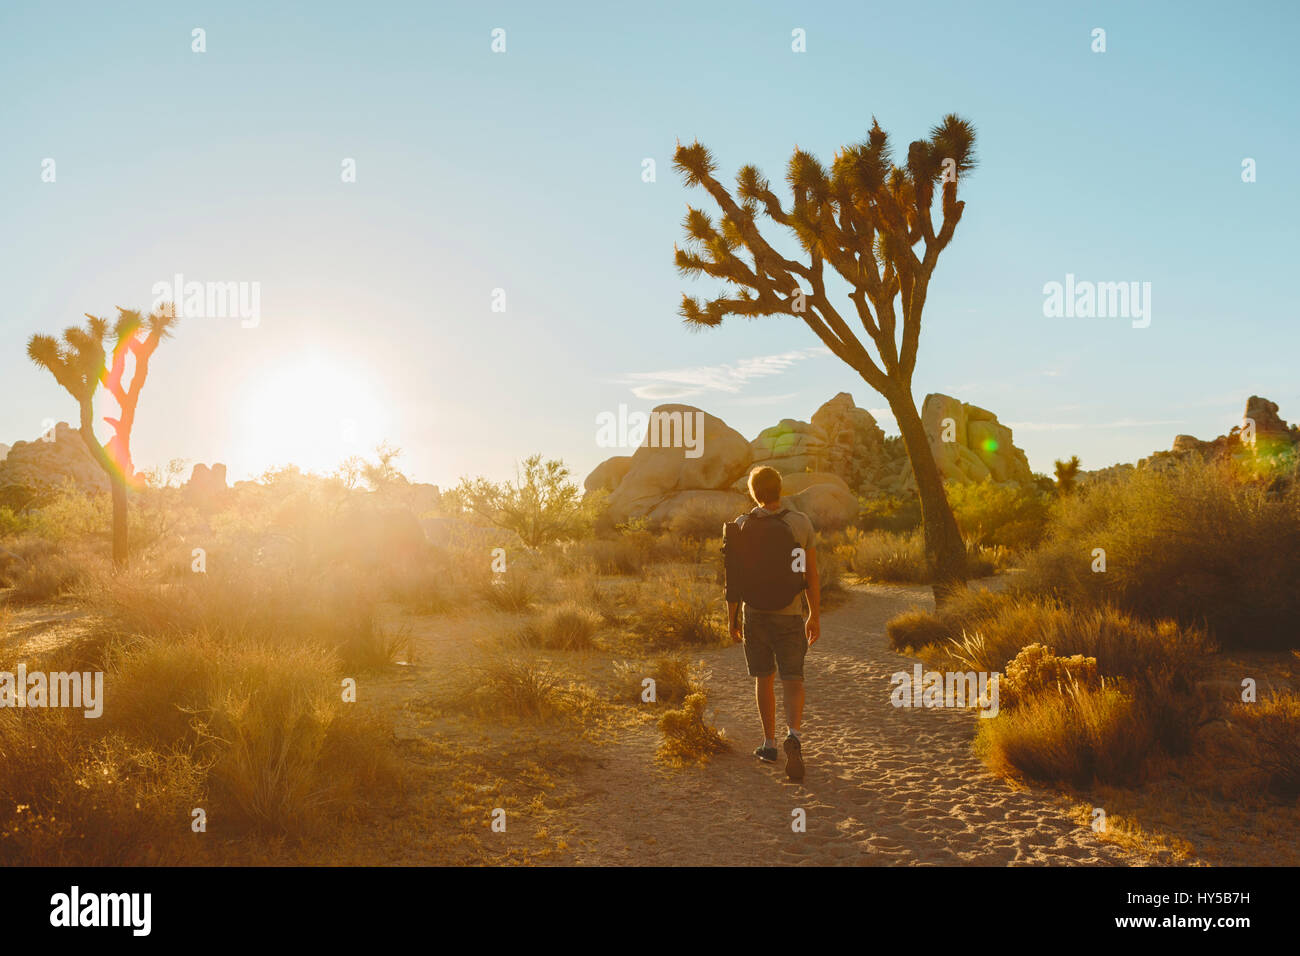 USA, California, Joshua Tree National Park, Man hiking at sunset - Stock Image